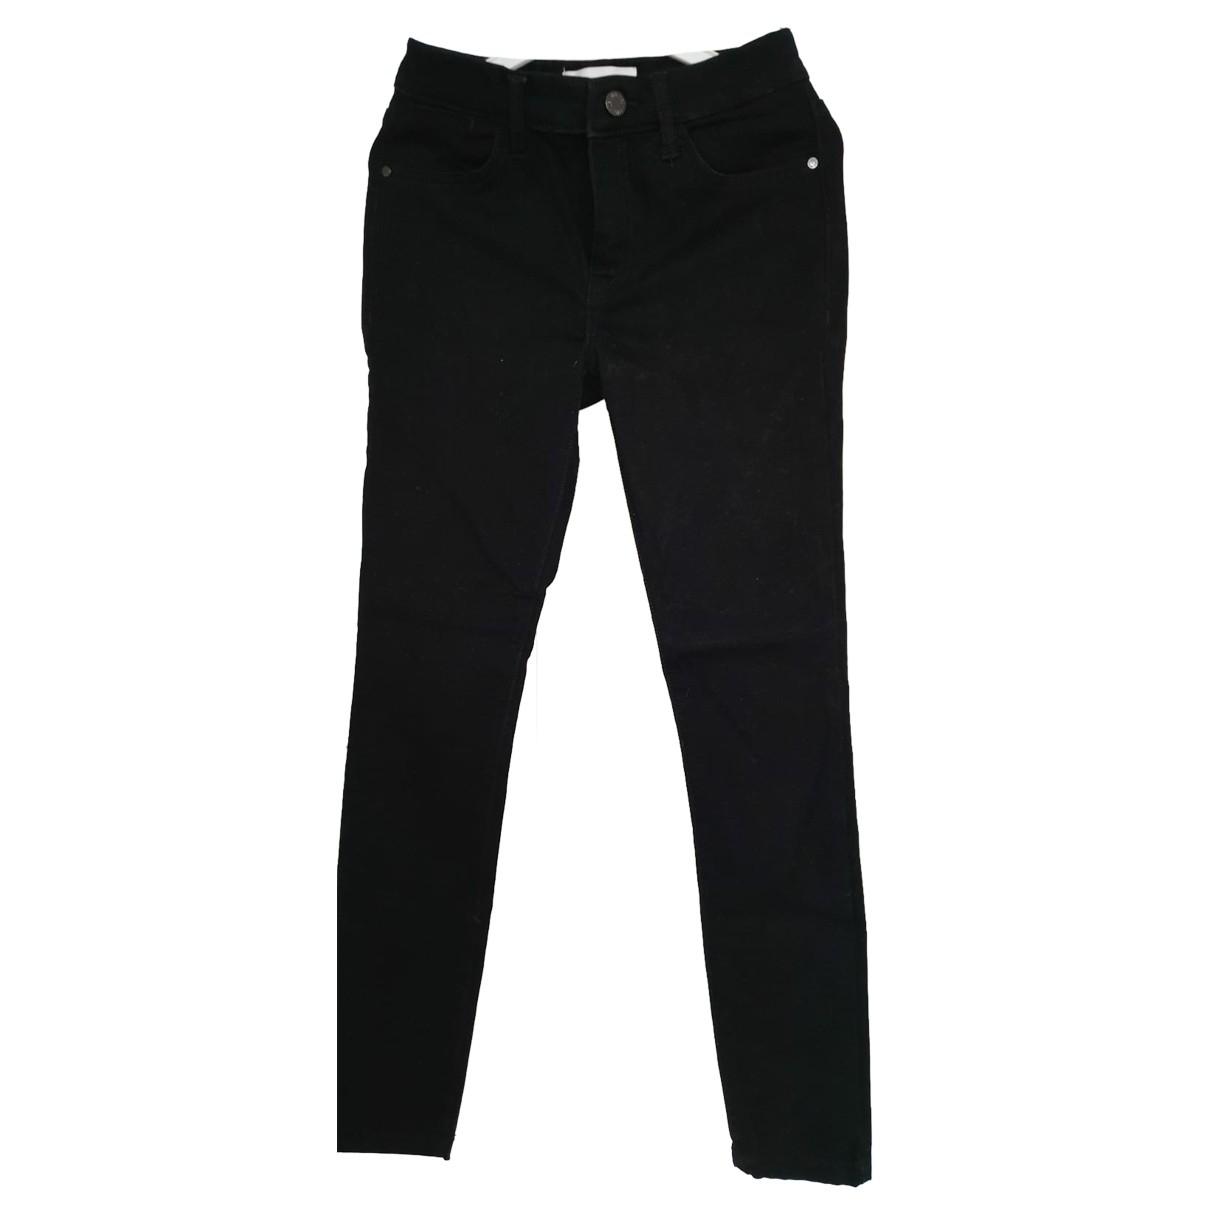 Mango \N Black Cotton - elasthane Jeans for Women 34 FR